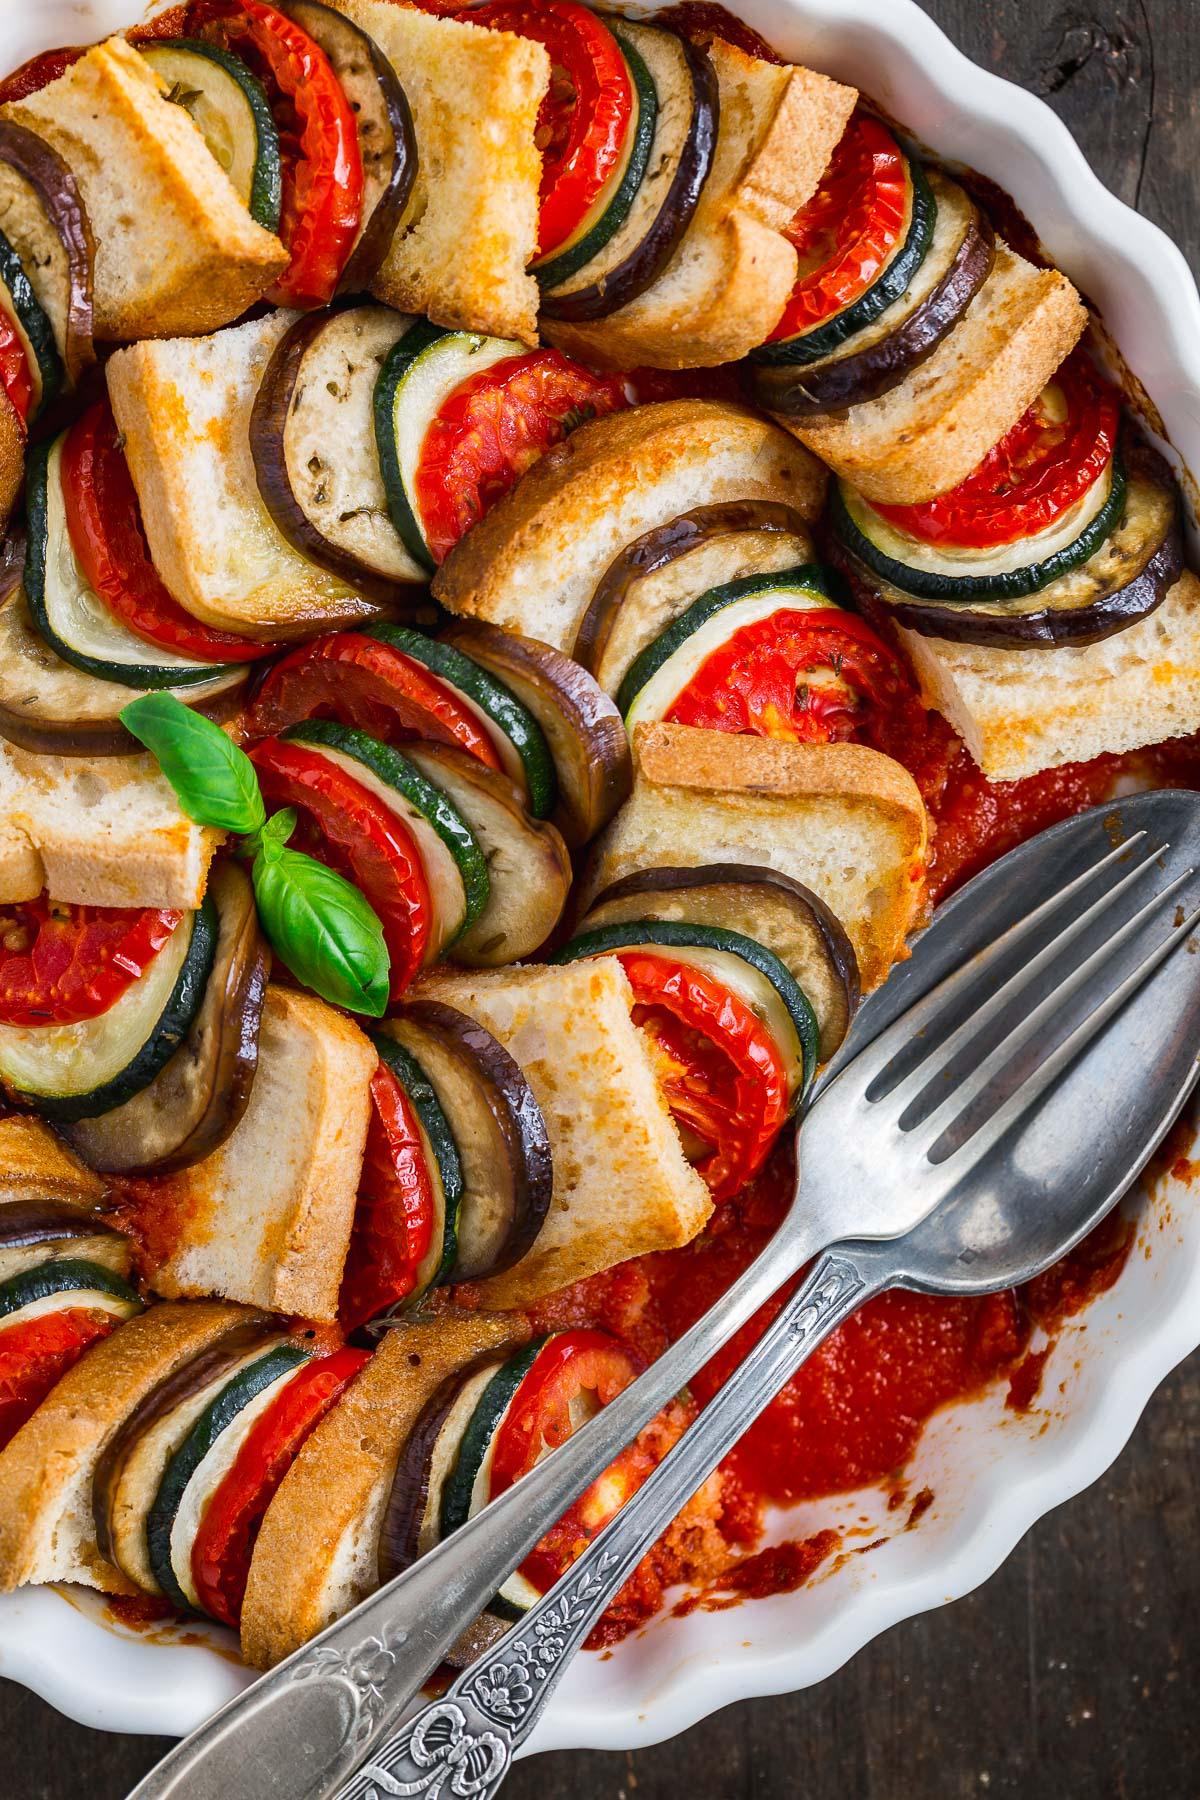 VEGETABLE BREAD RATATOUILLE TIAN recipe #vegan #glutenfree eggplant - TIAN RATATOUILLE di PANE senza glutine con verdure melanzane zucchine pomodori